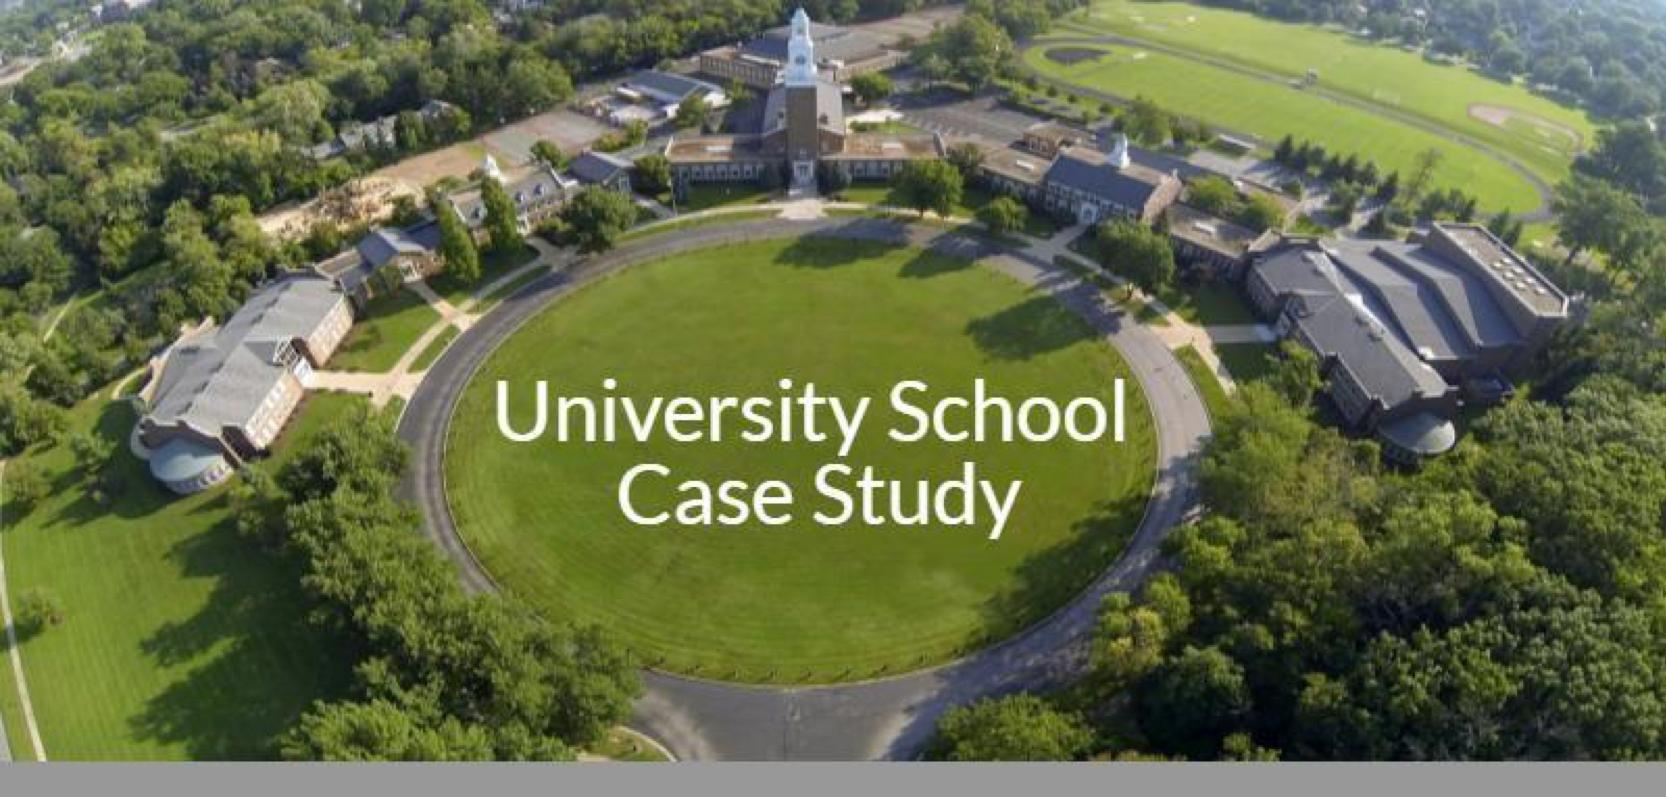 University School